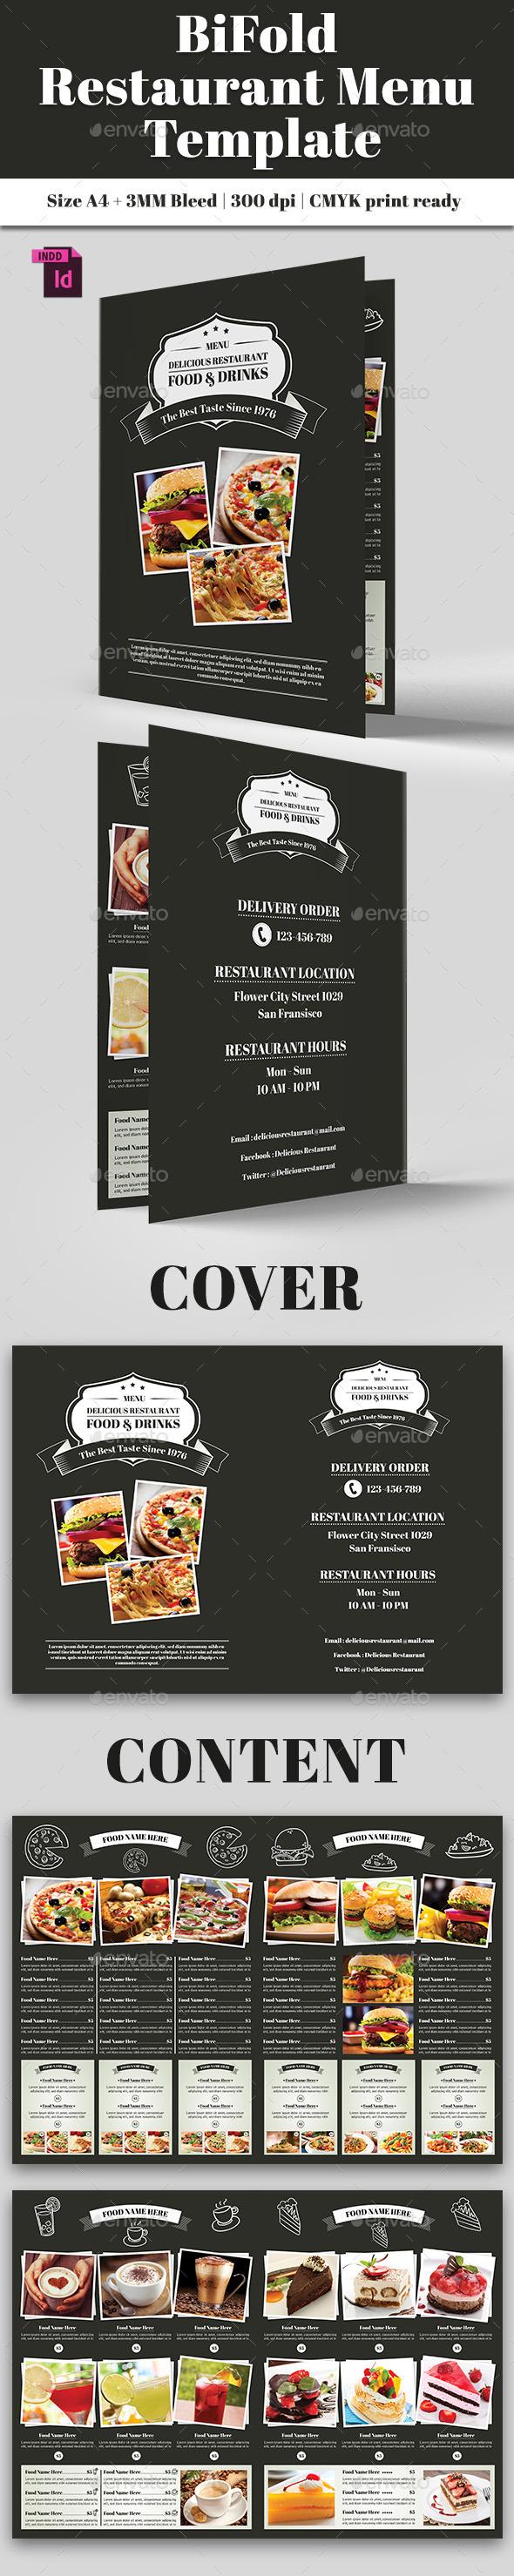 BiFold Restaurant Menu Vol. 8 - Food Menus Print Templates